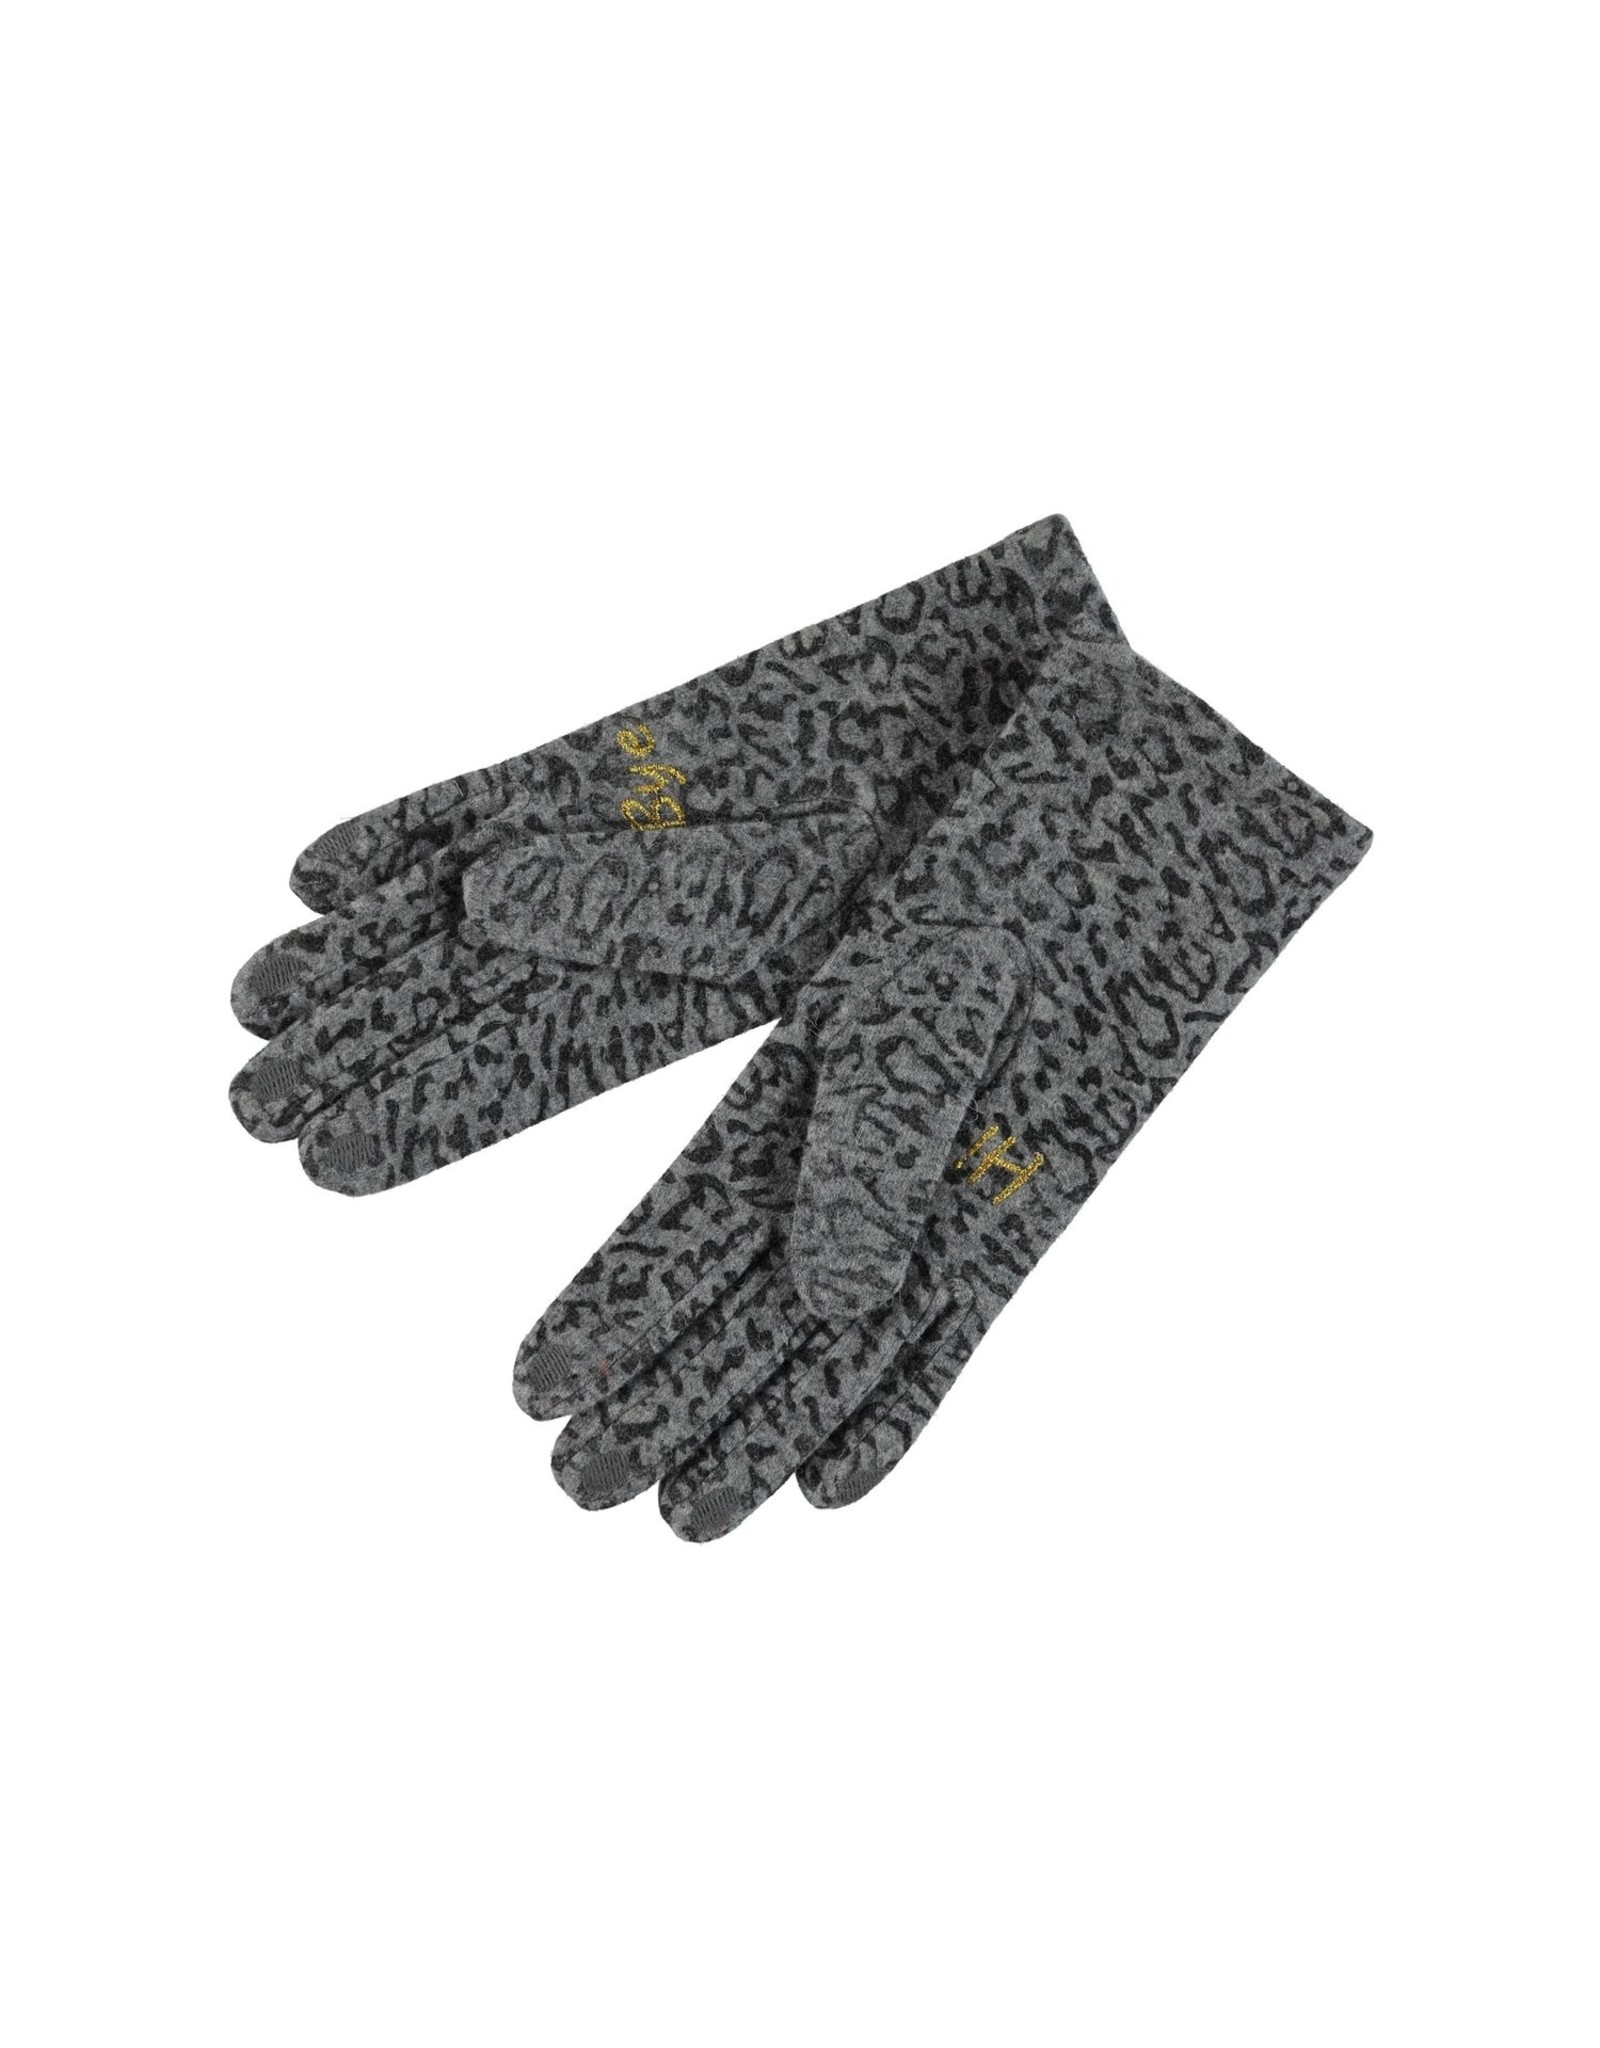 Birds on the run Glove Wool Allover Printed Animal 15121